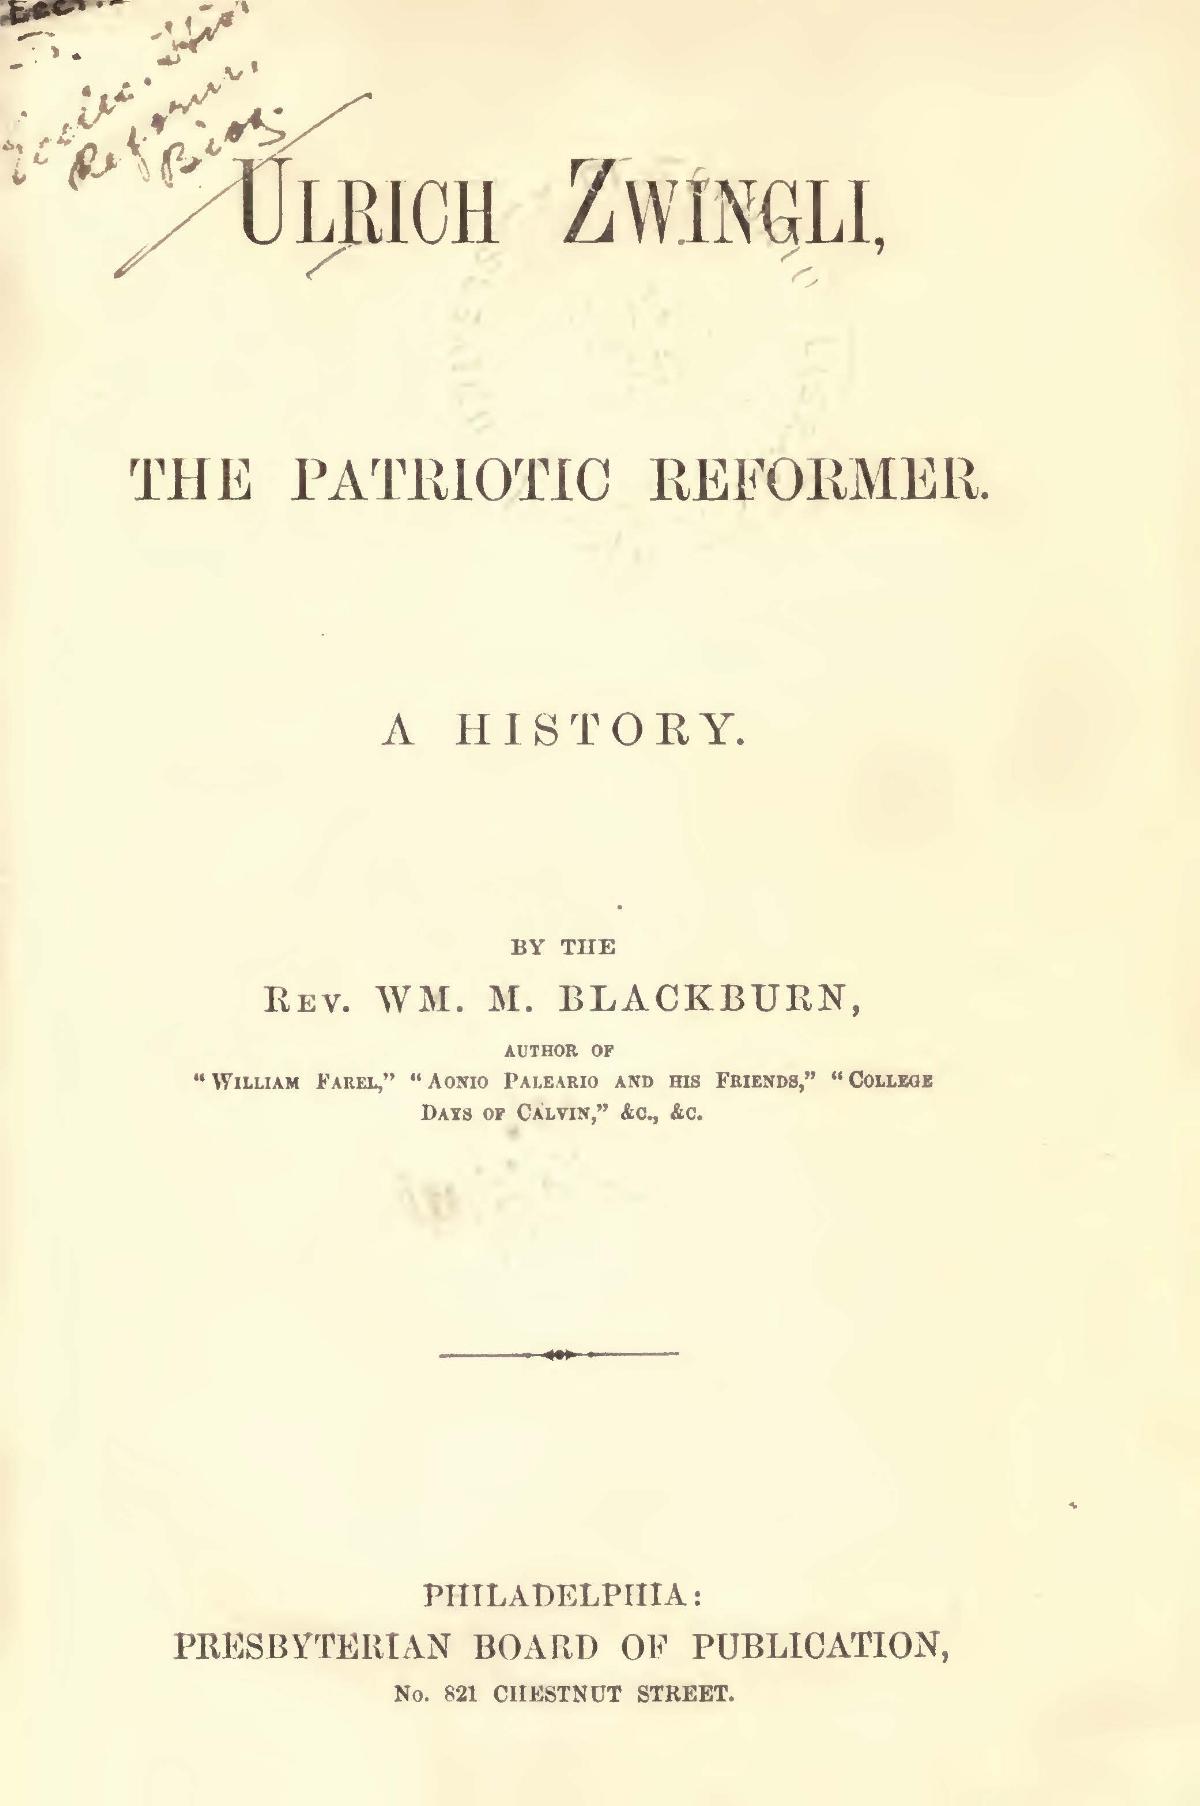 Blackburn, William Maxwell, Ulrich Zwingli The Patriotic Reformer Title Page.jpg